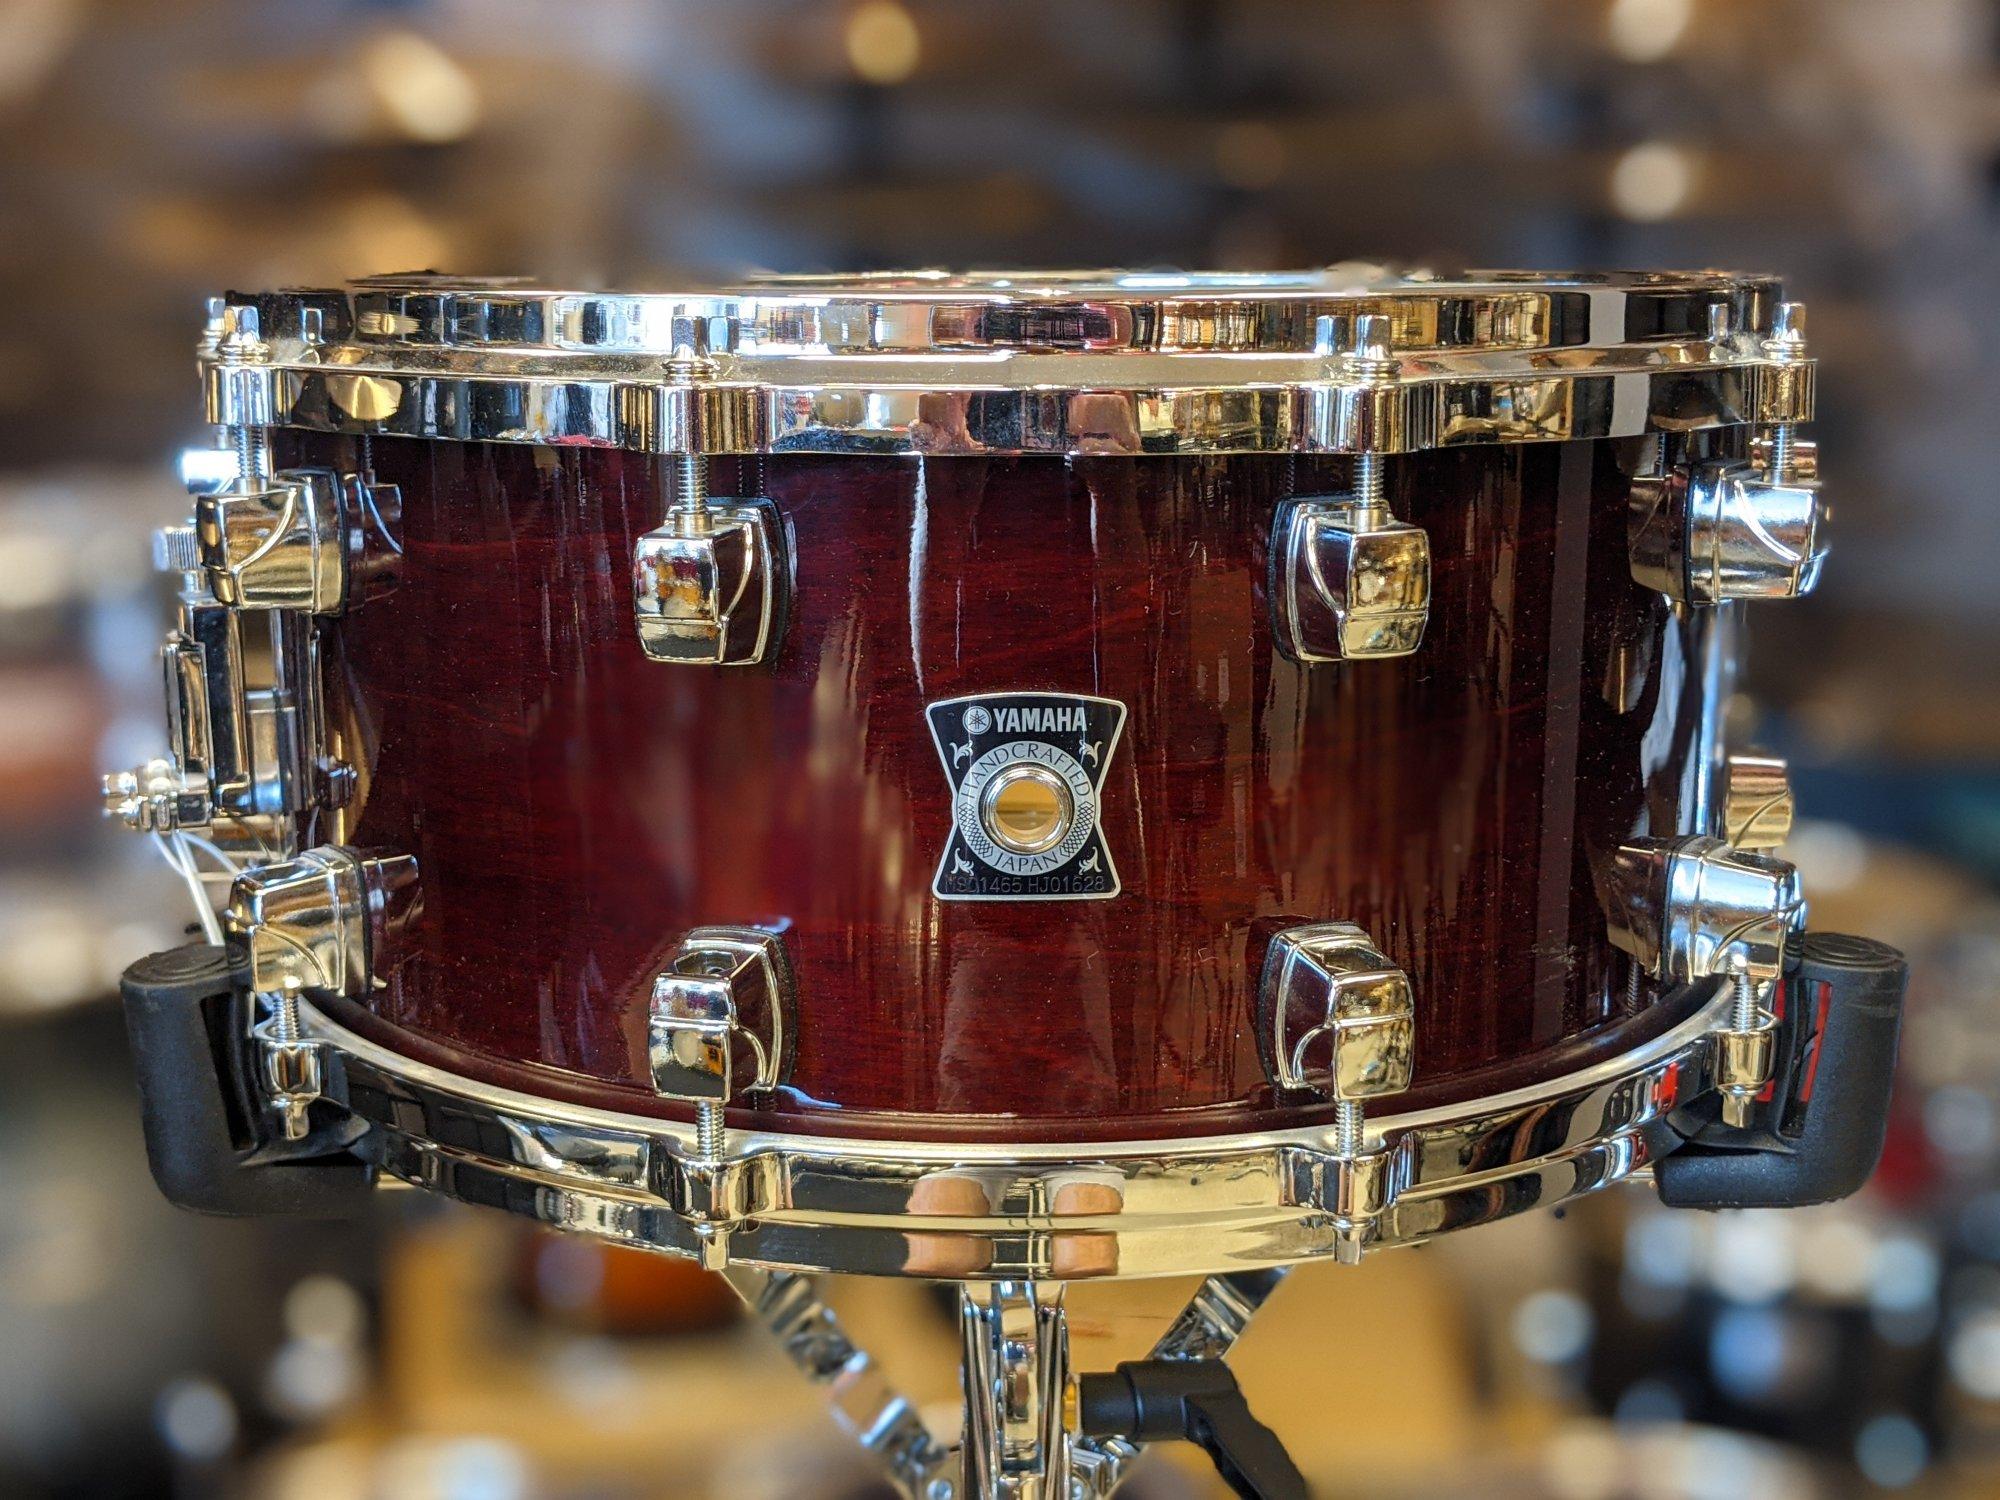 Yamaha Sensitive Series Maple Snare Drum 6.5 x 14